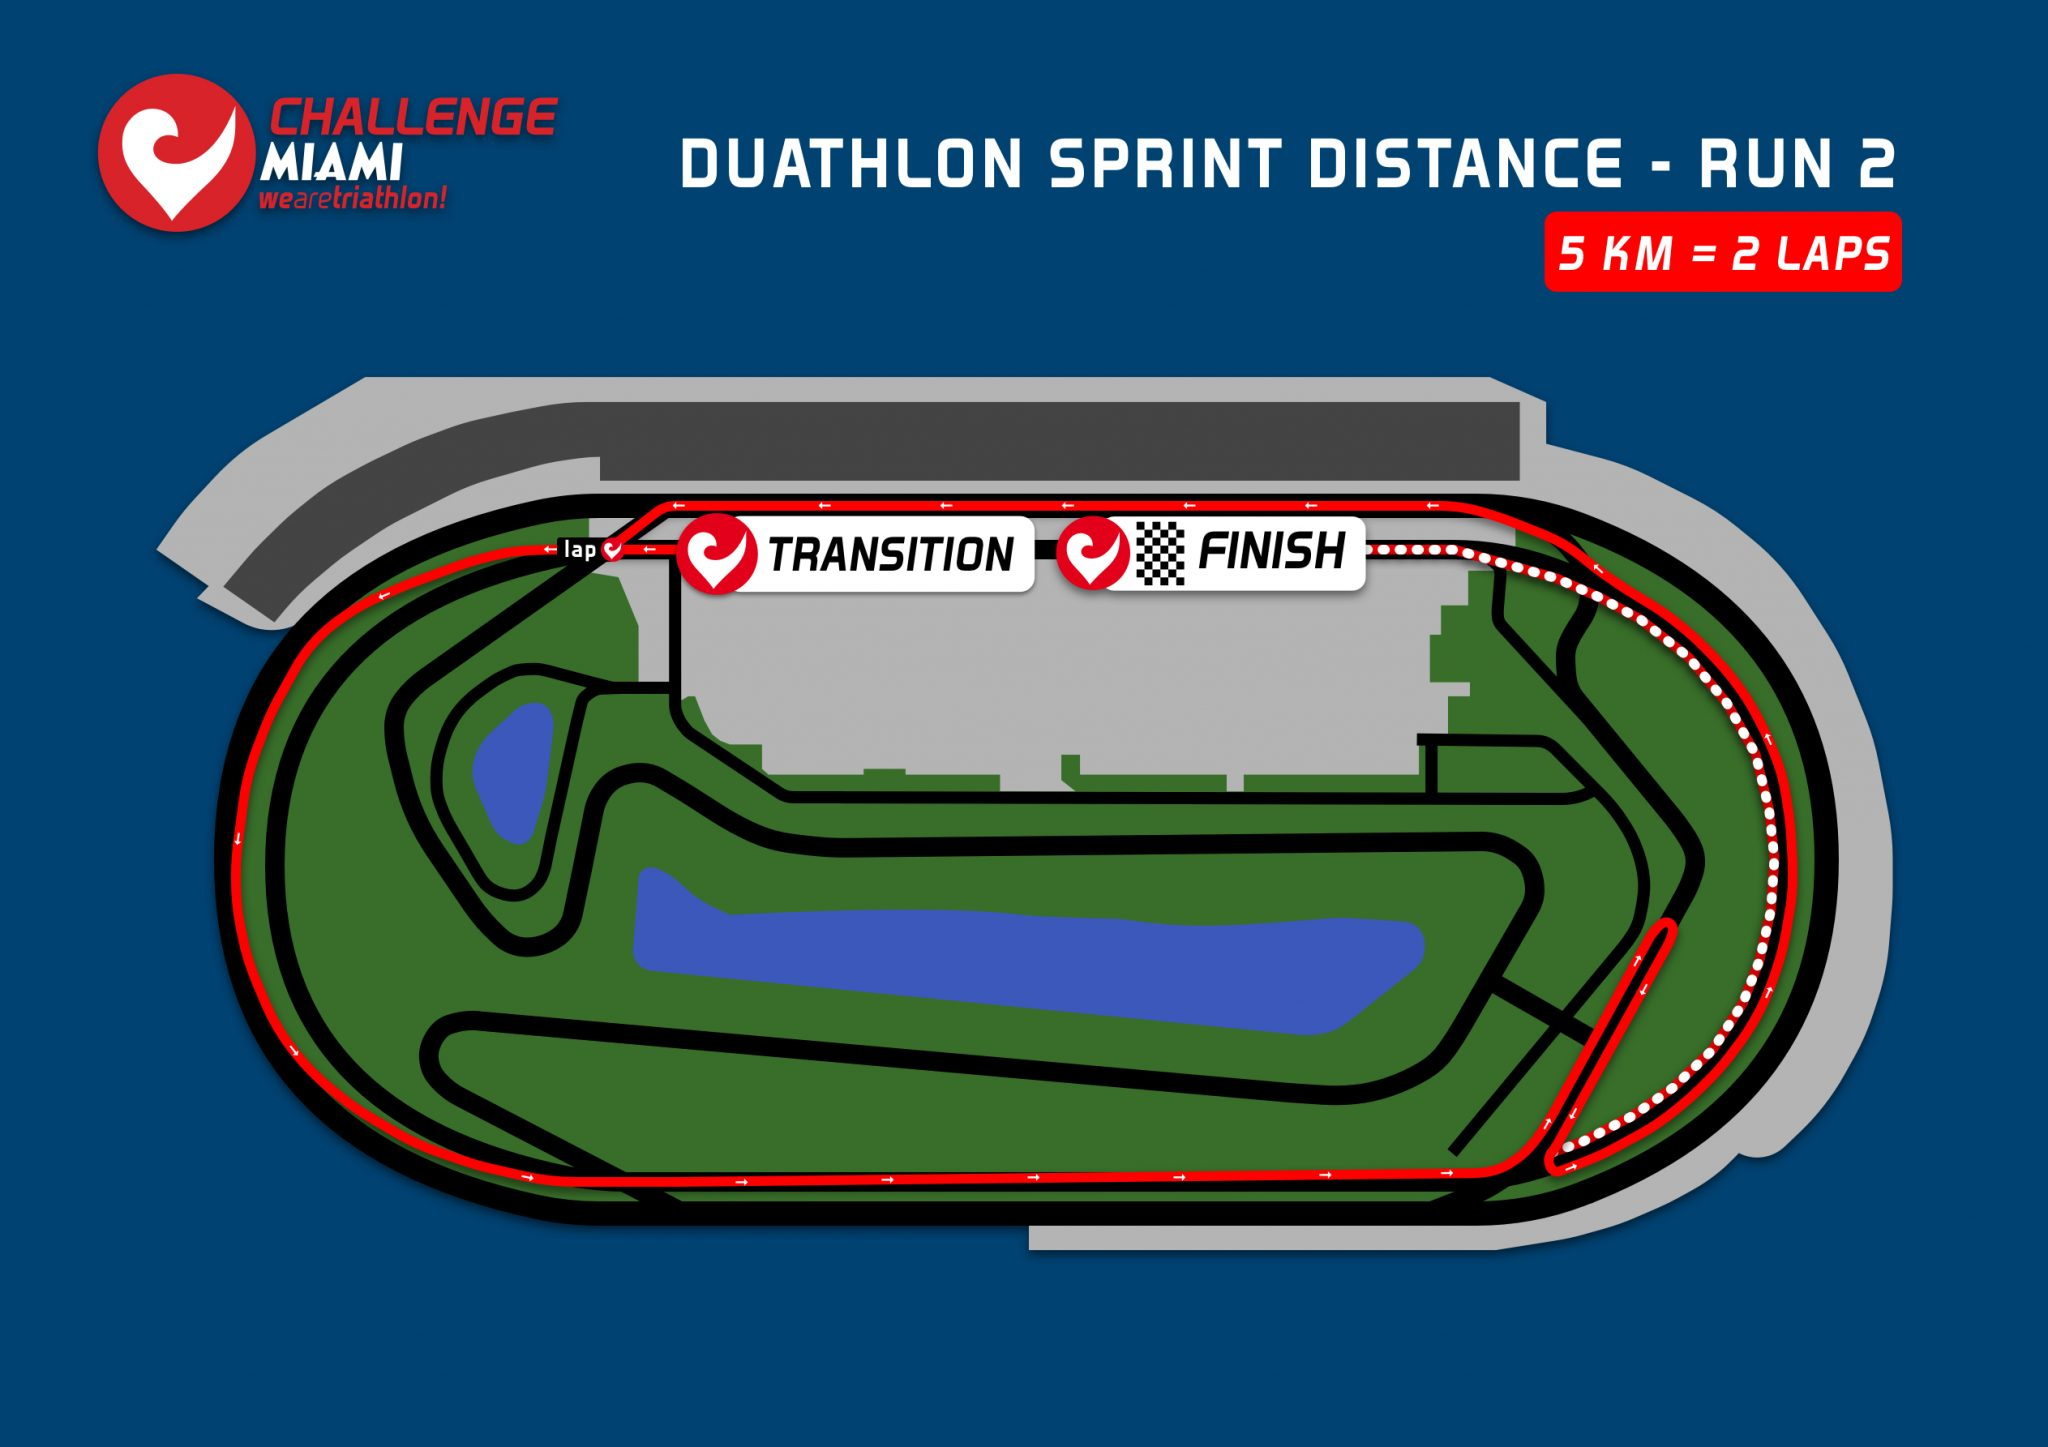 Sprint Distance Duathlon